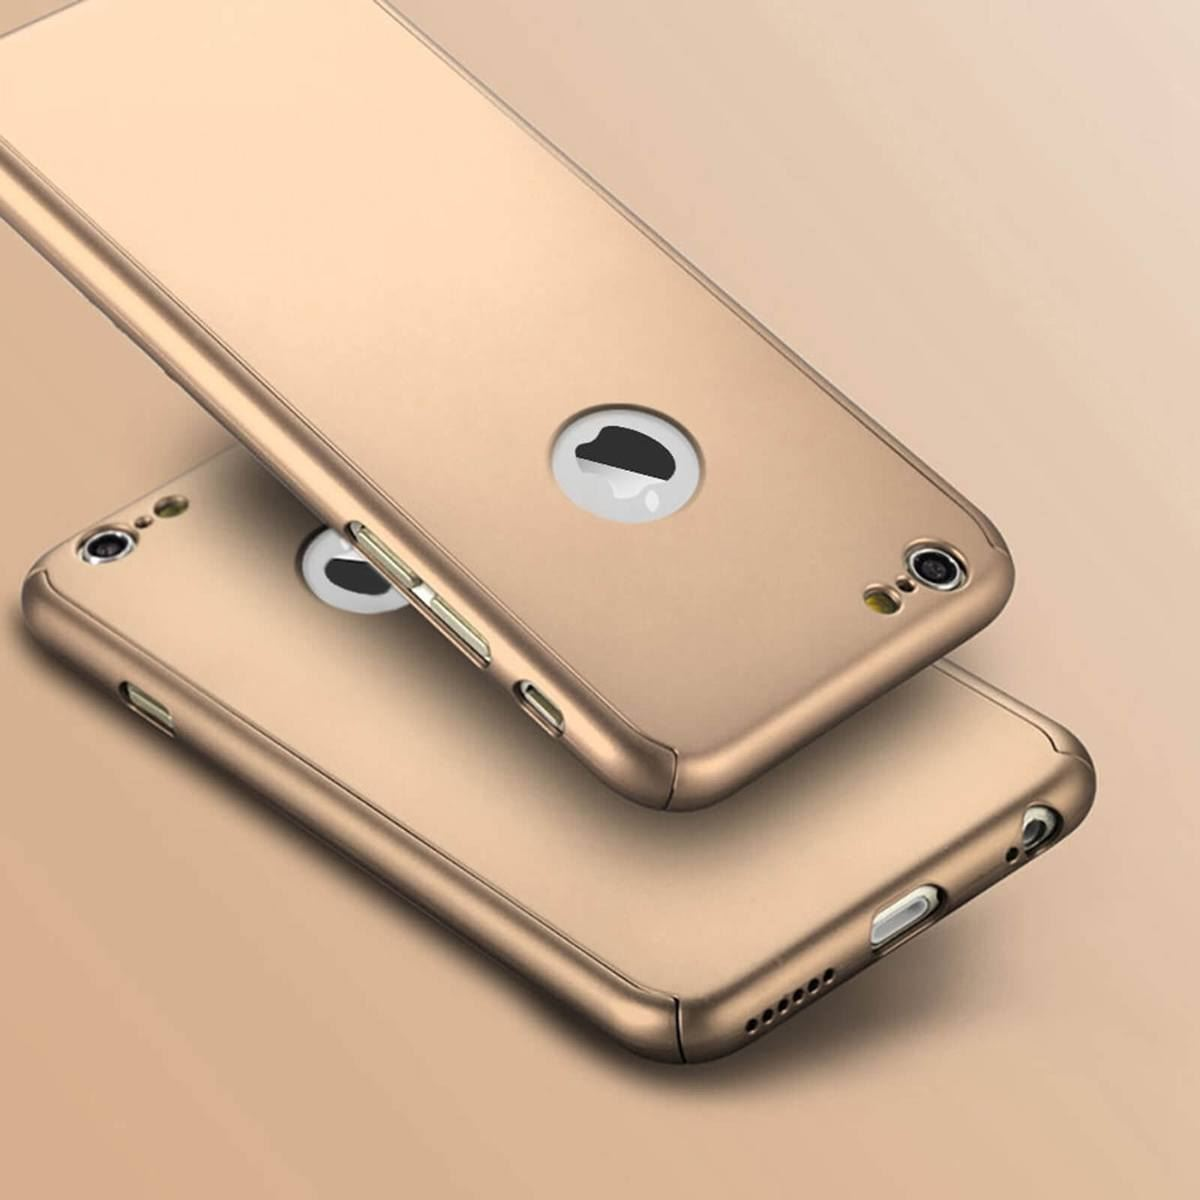 For-Apple-iPhone-XS-Max-XR-Hybrid-360-Slim-Ultra-Thin-Heavy-Duty-Shockproof-Case Indexbild 65